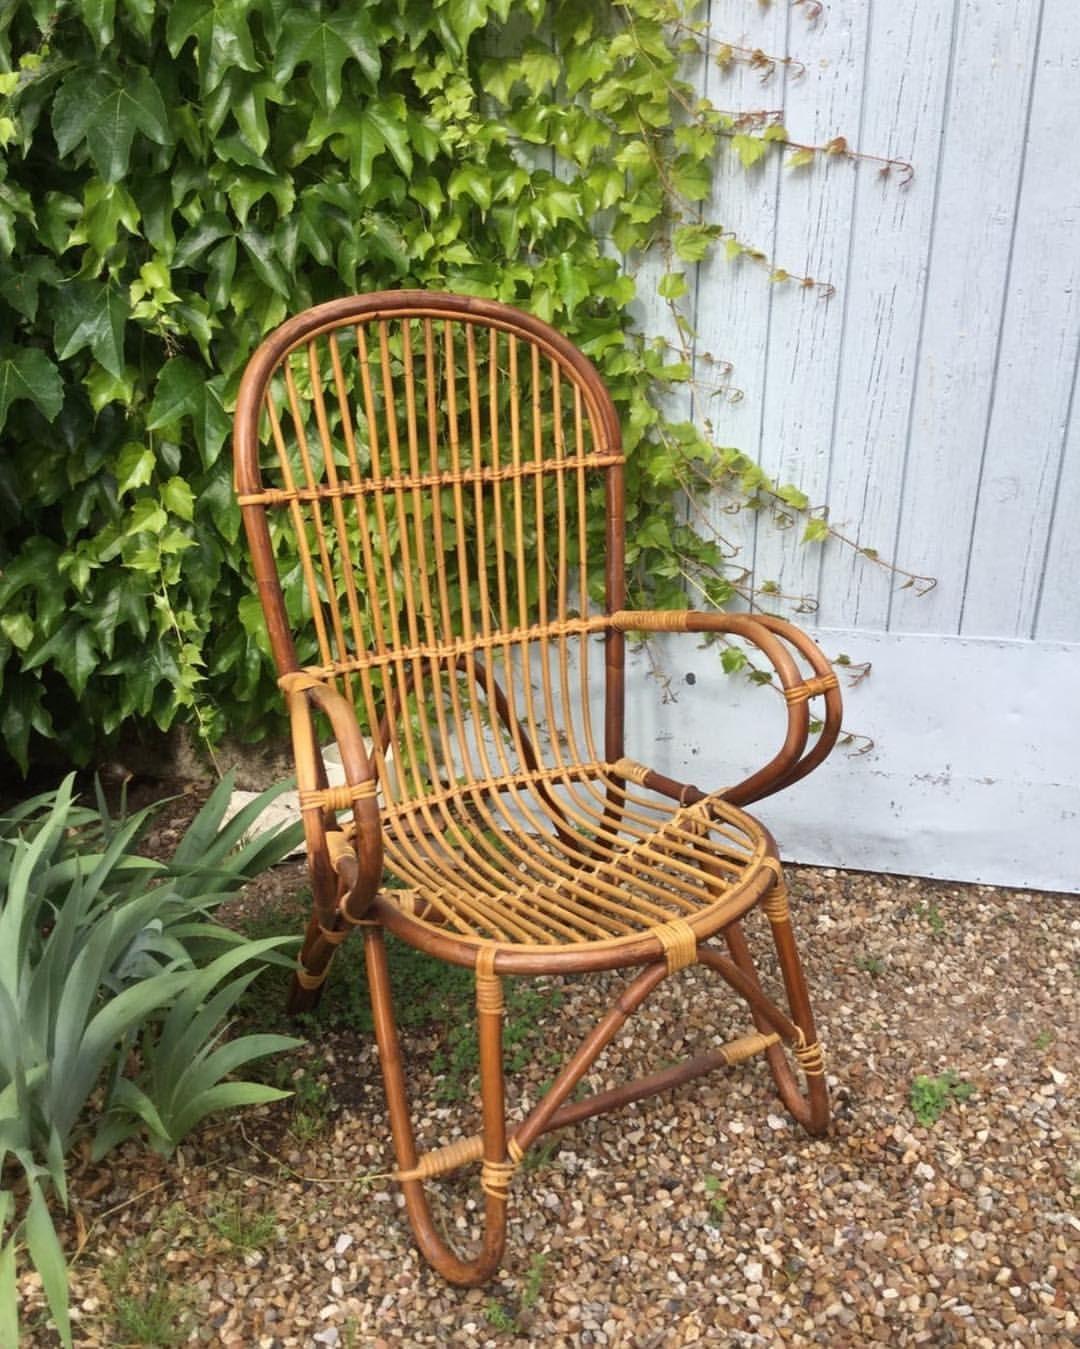 Fauteuil Rotin Vintage Brocantedelapoesie Selency Fauteuilrotin Fauteuilrotinvintage Maisondecampagne Terrasse Ba Rattan Furniture Outdoor Chairs Wicker Chair